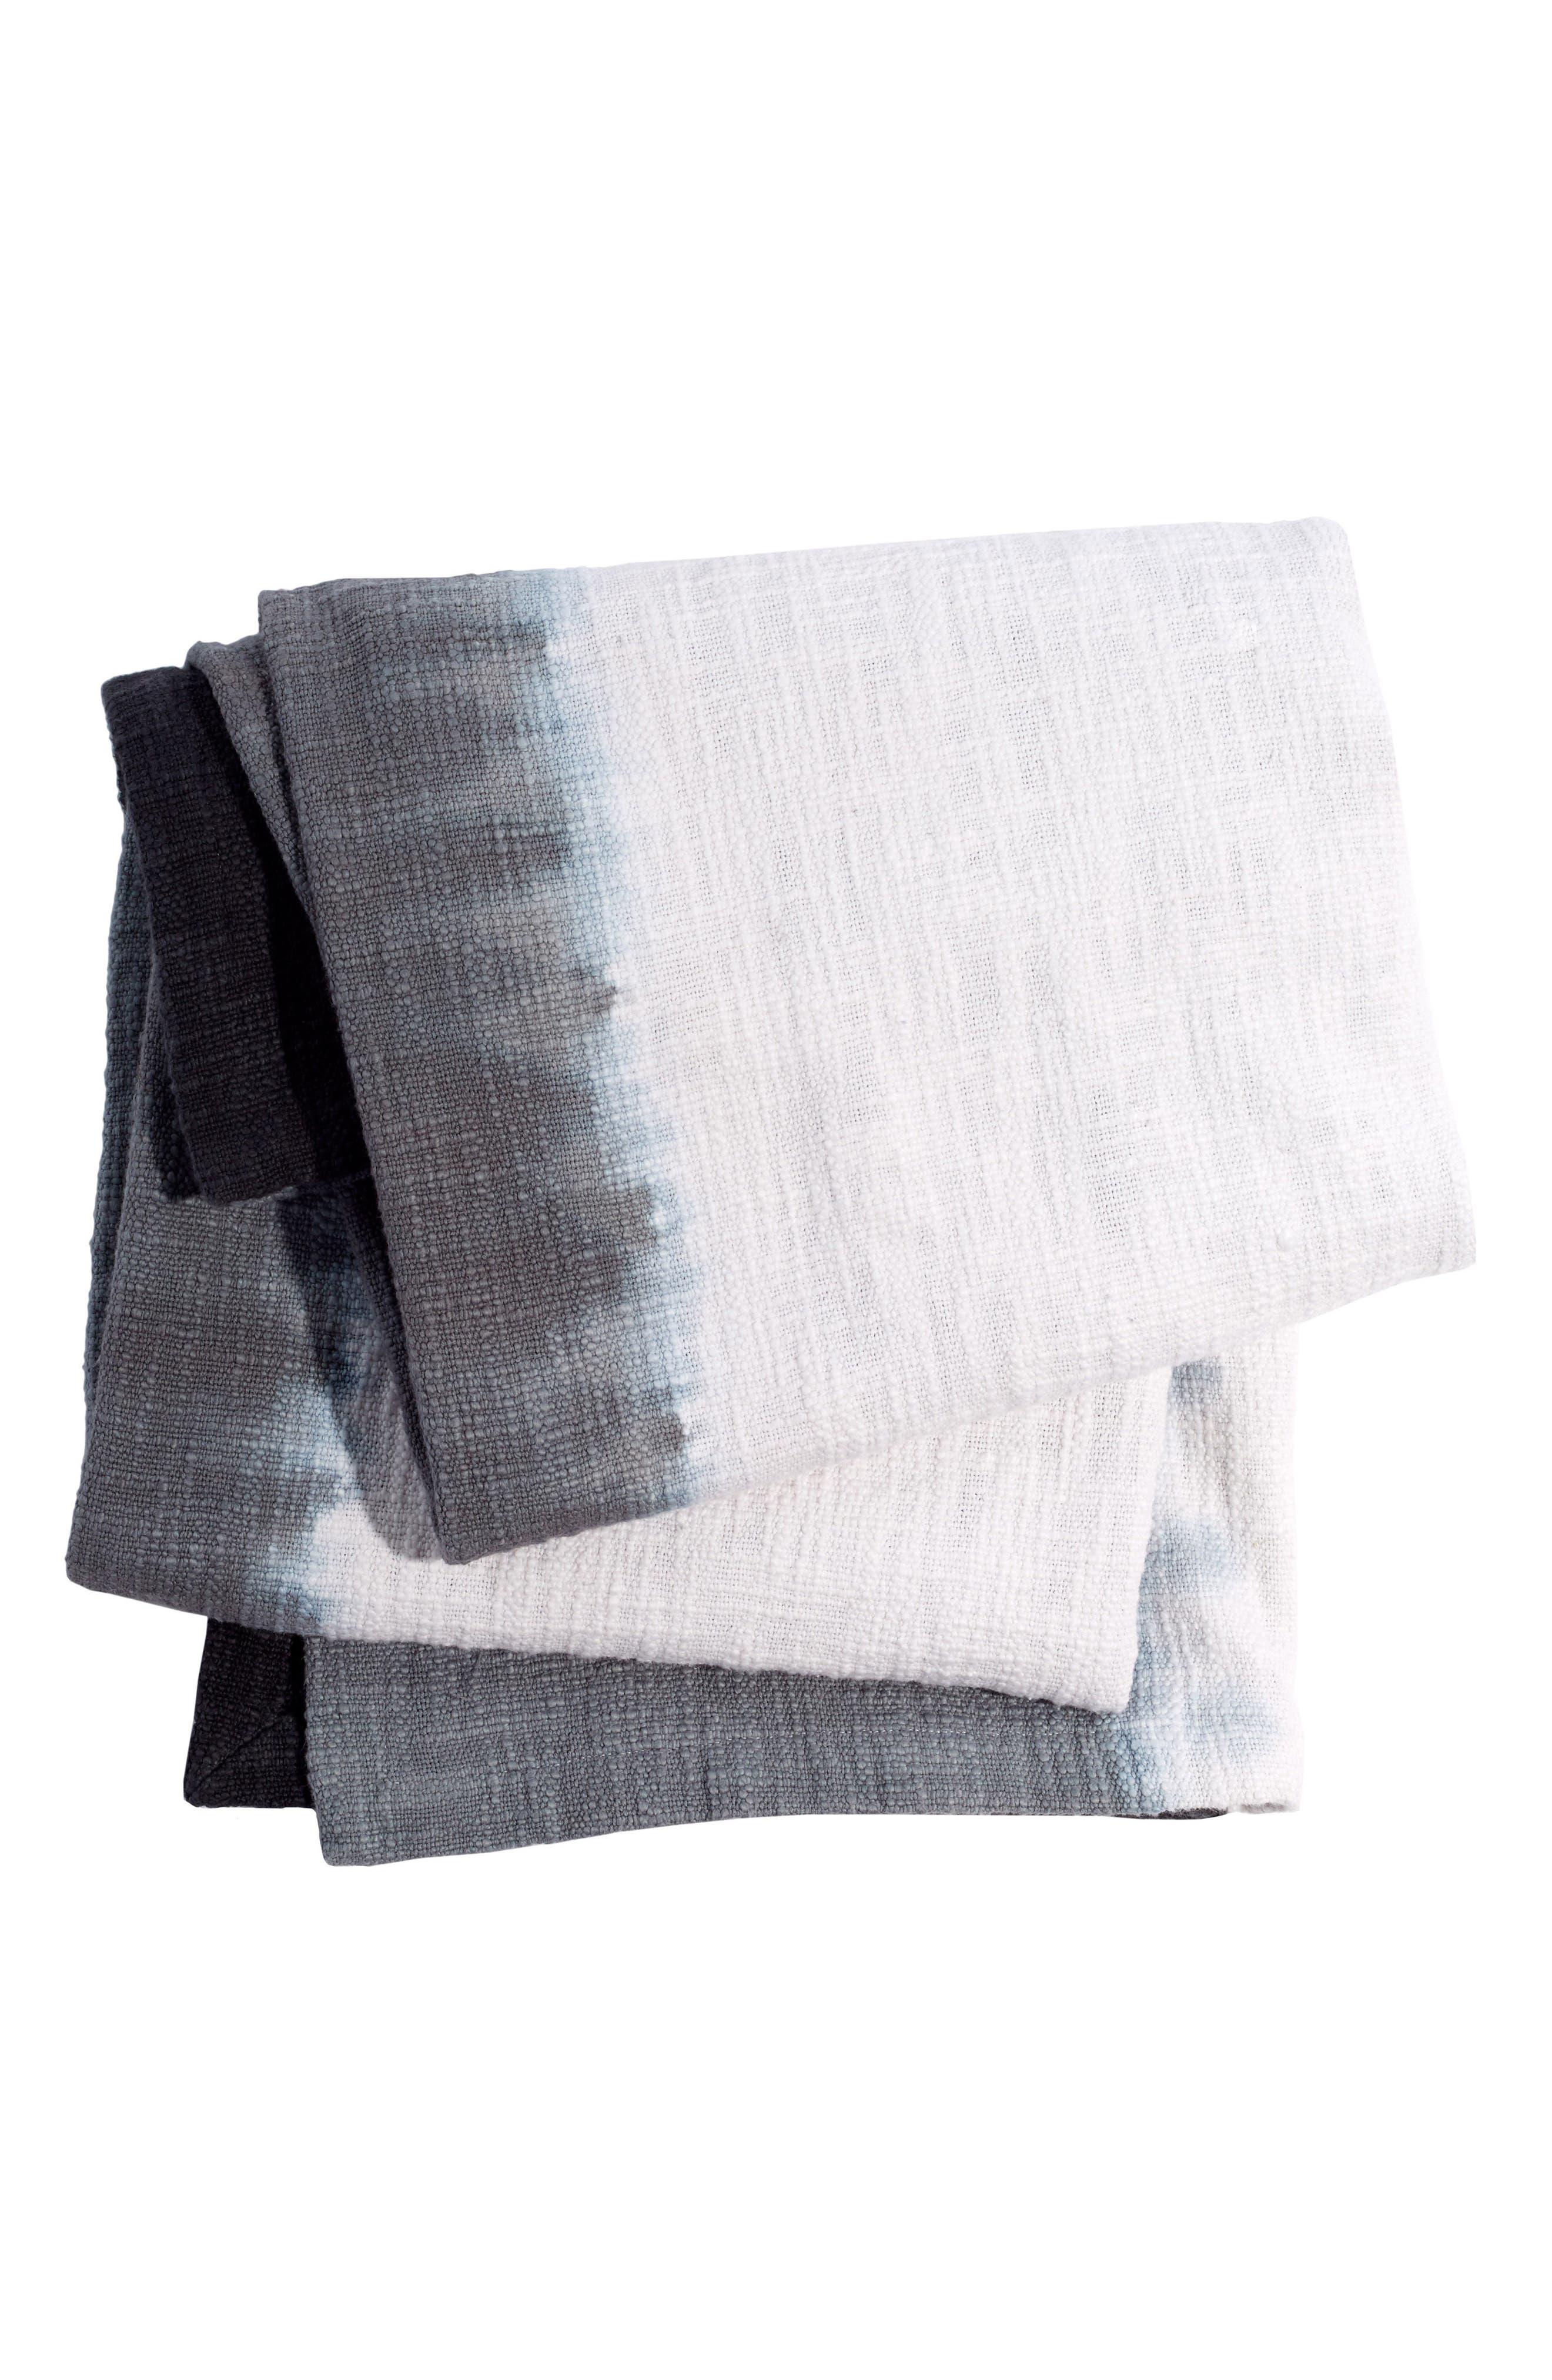 Maneka Dip Dye Throw Blanket,                         Main,                         color, Grey/ White